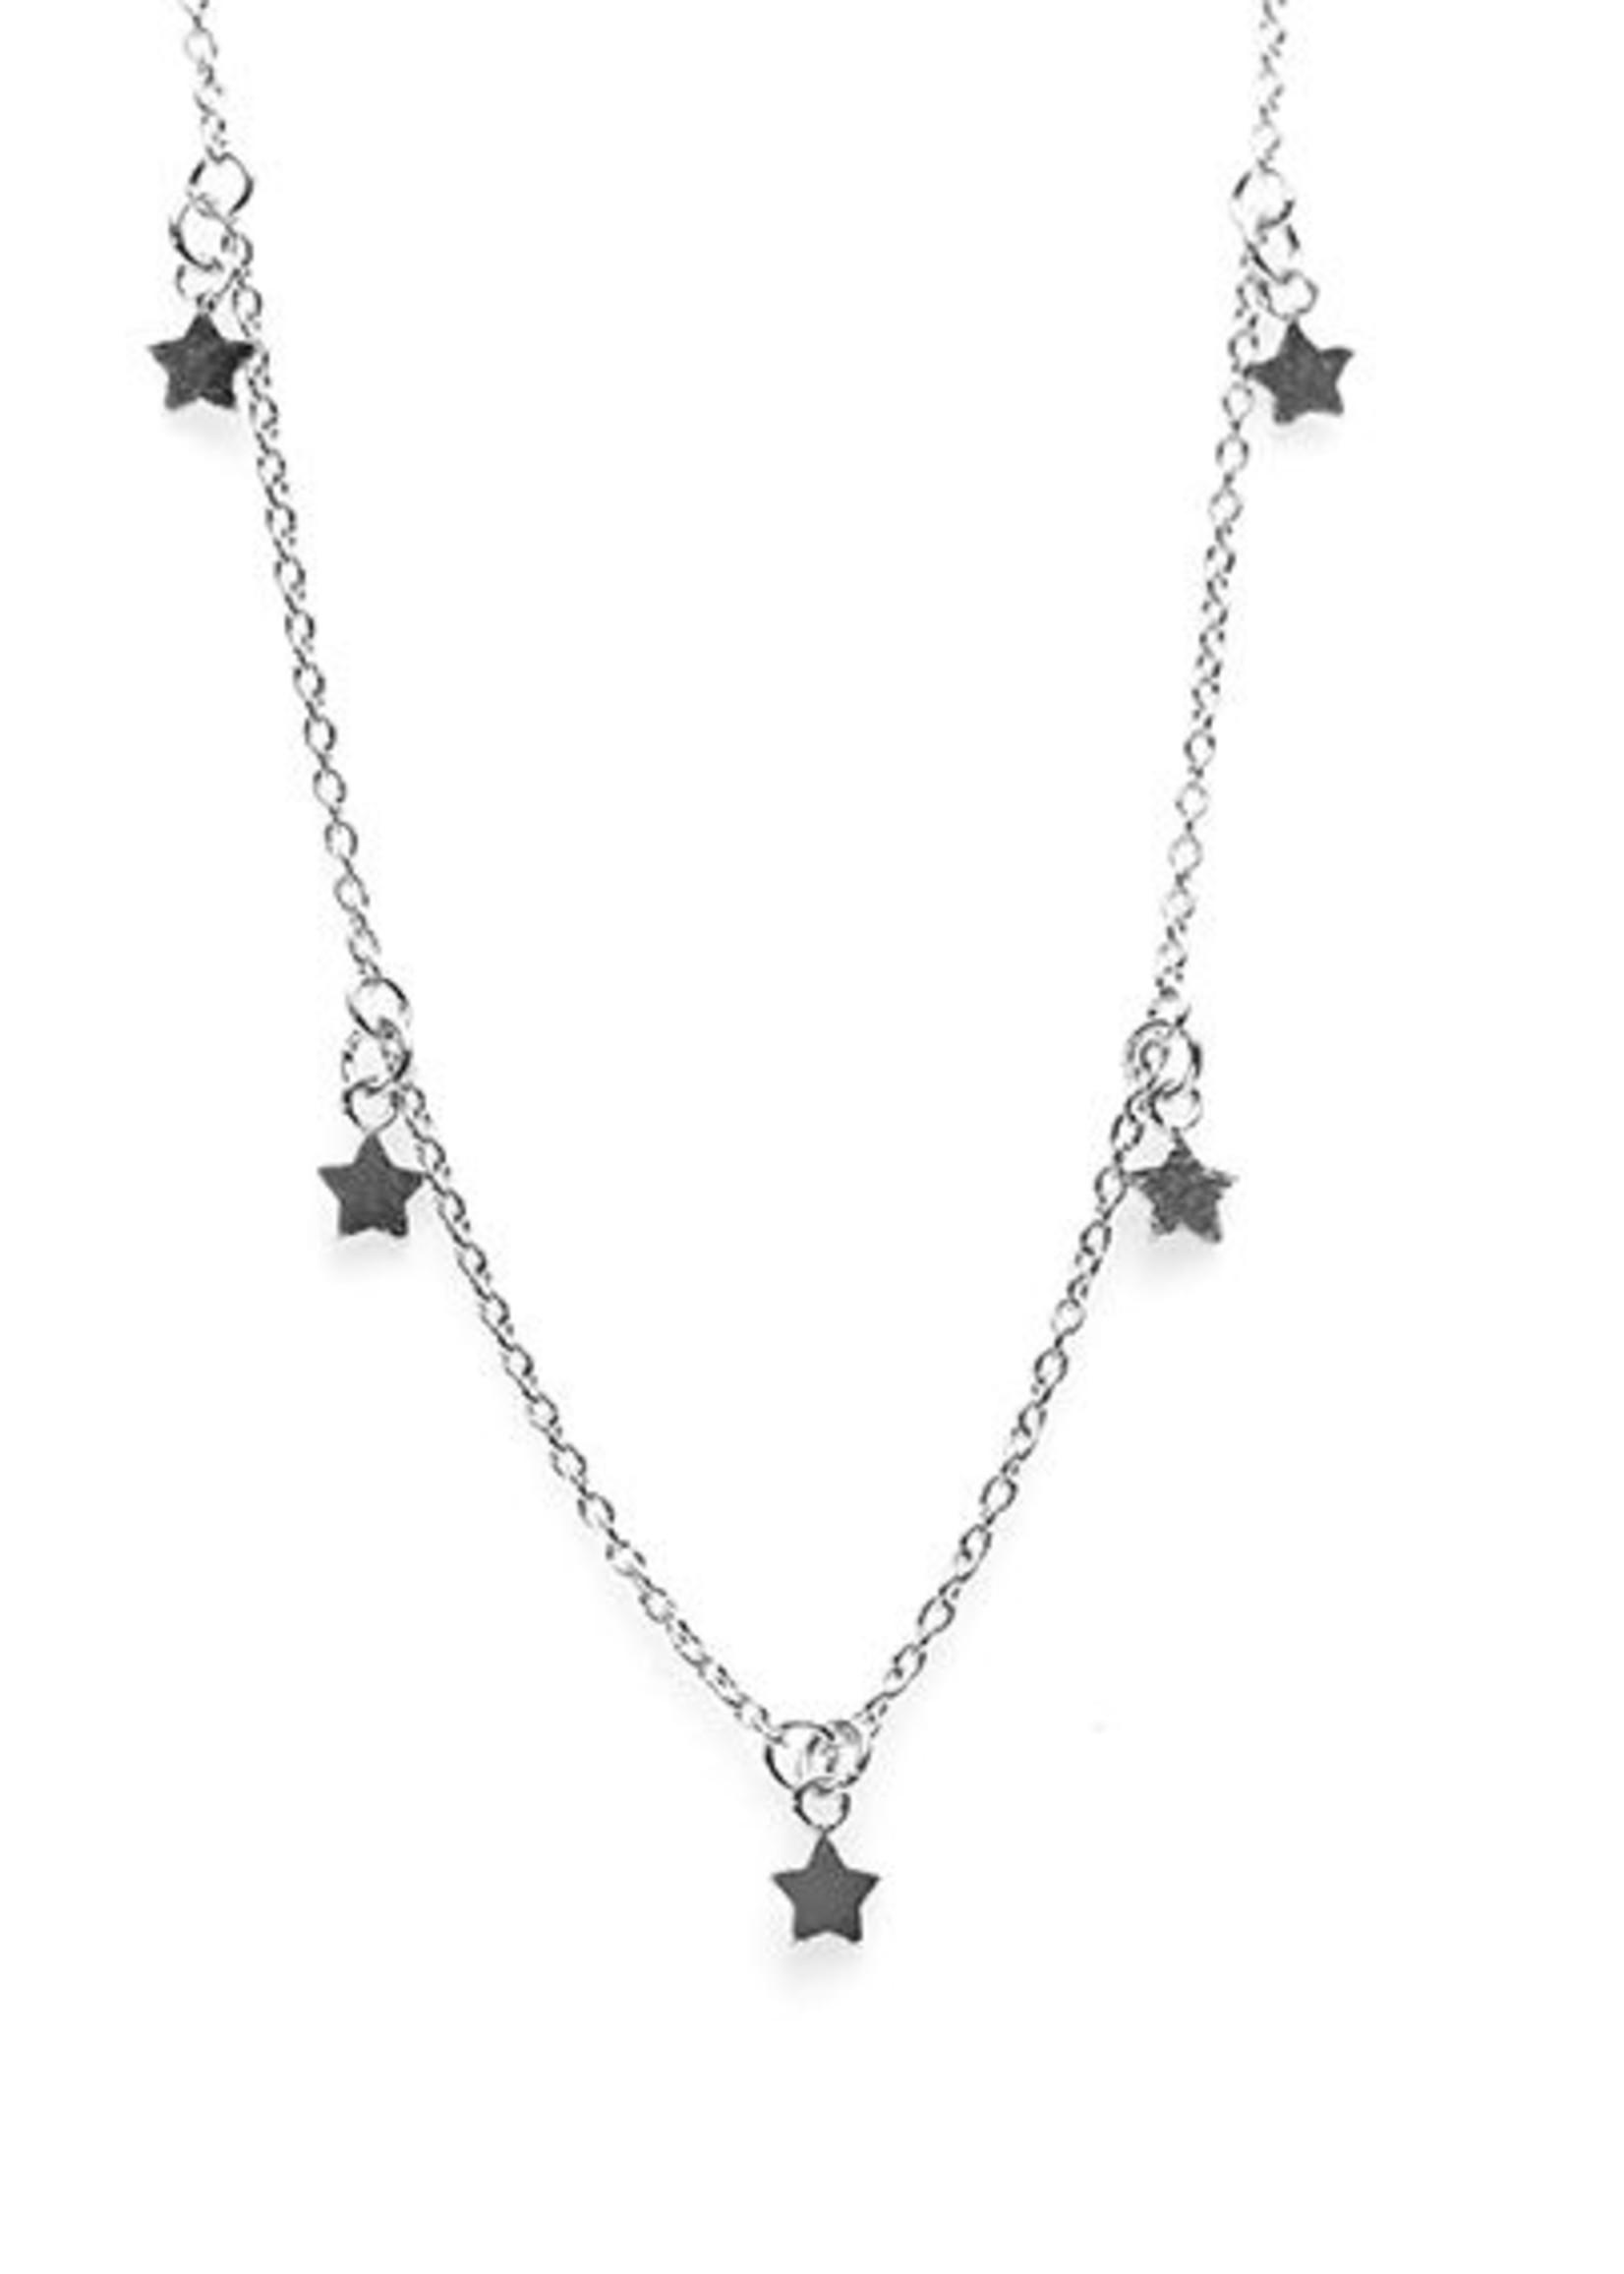 Karma Necklace 5 Stars Silver